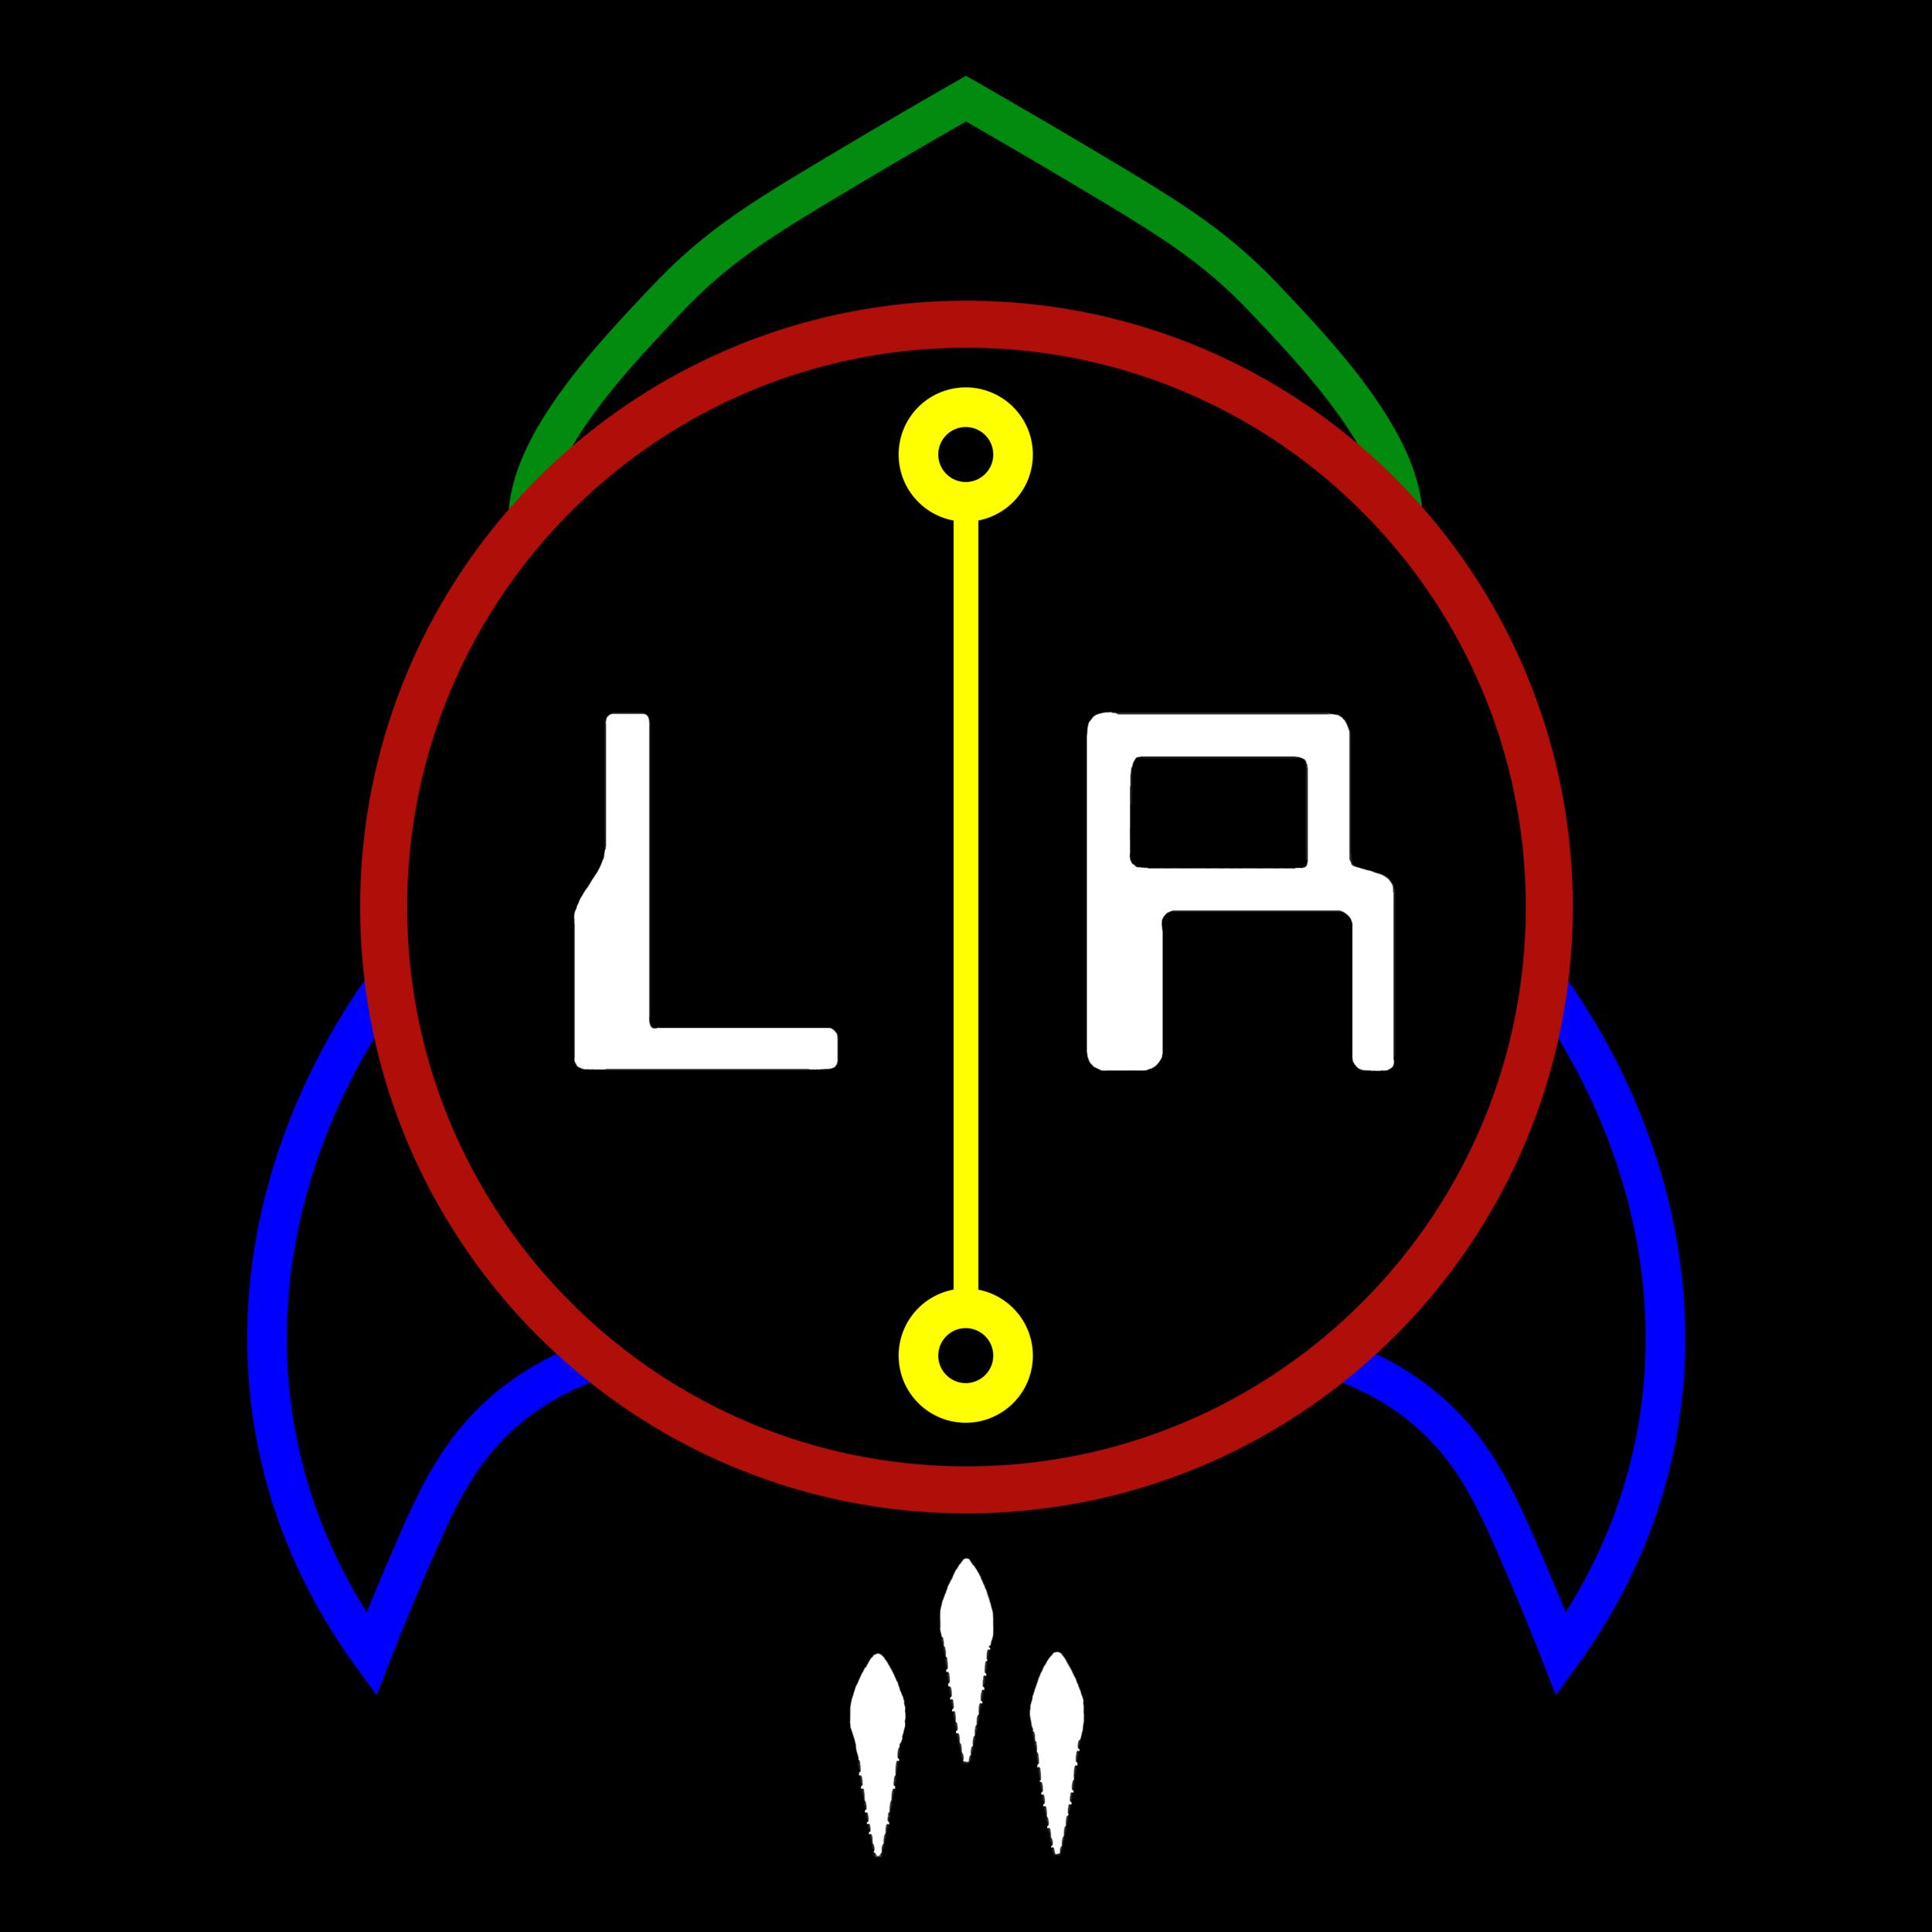 Life Rocketed logo